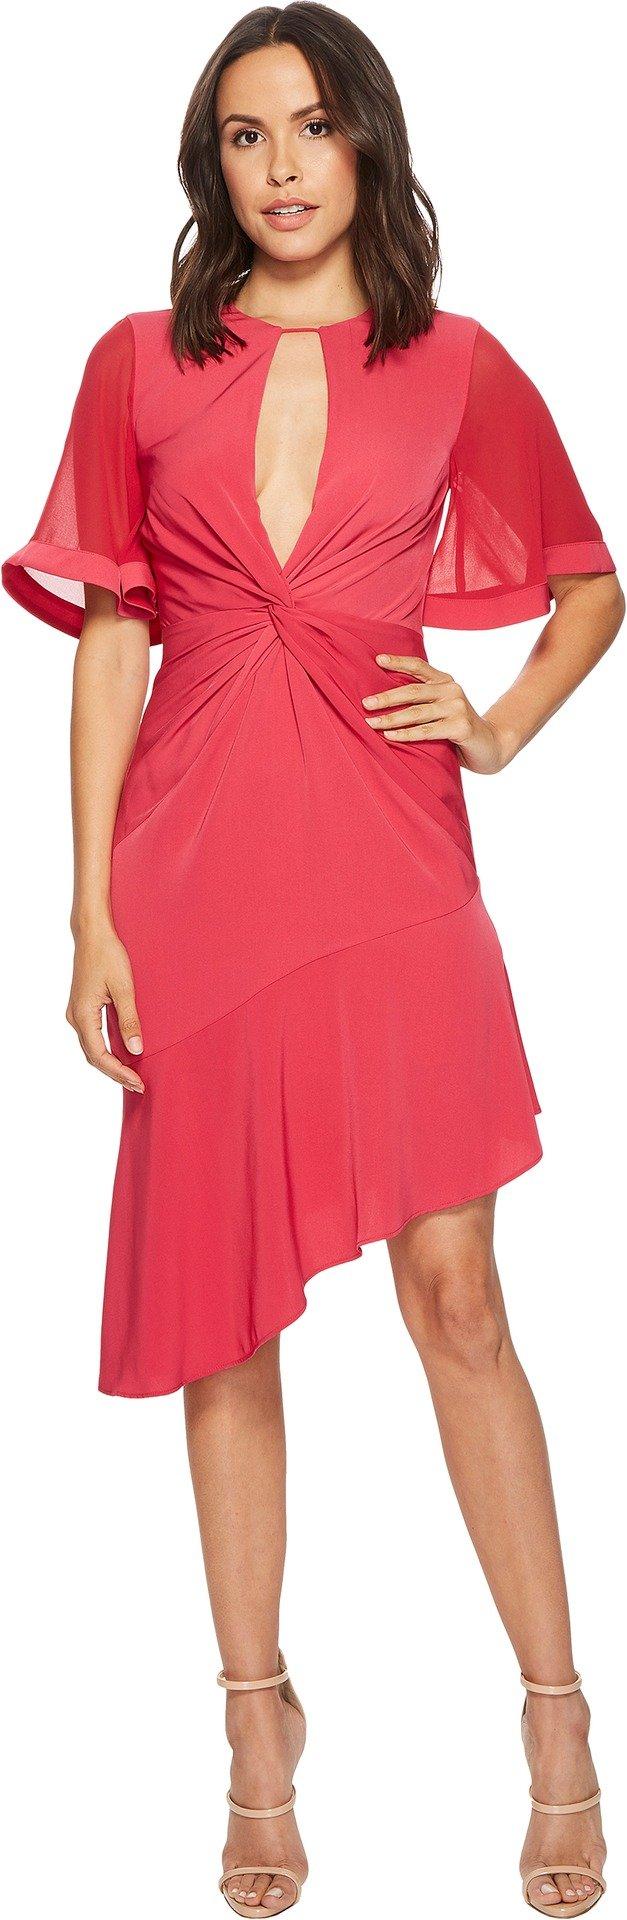 Available at Amazon: Keepsake The Label Women's No Love Mini Dress